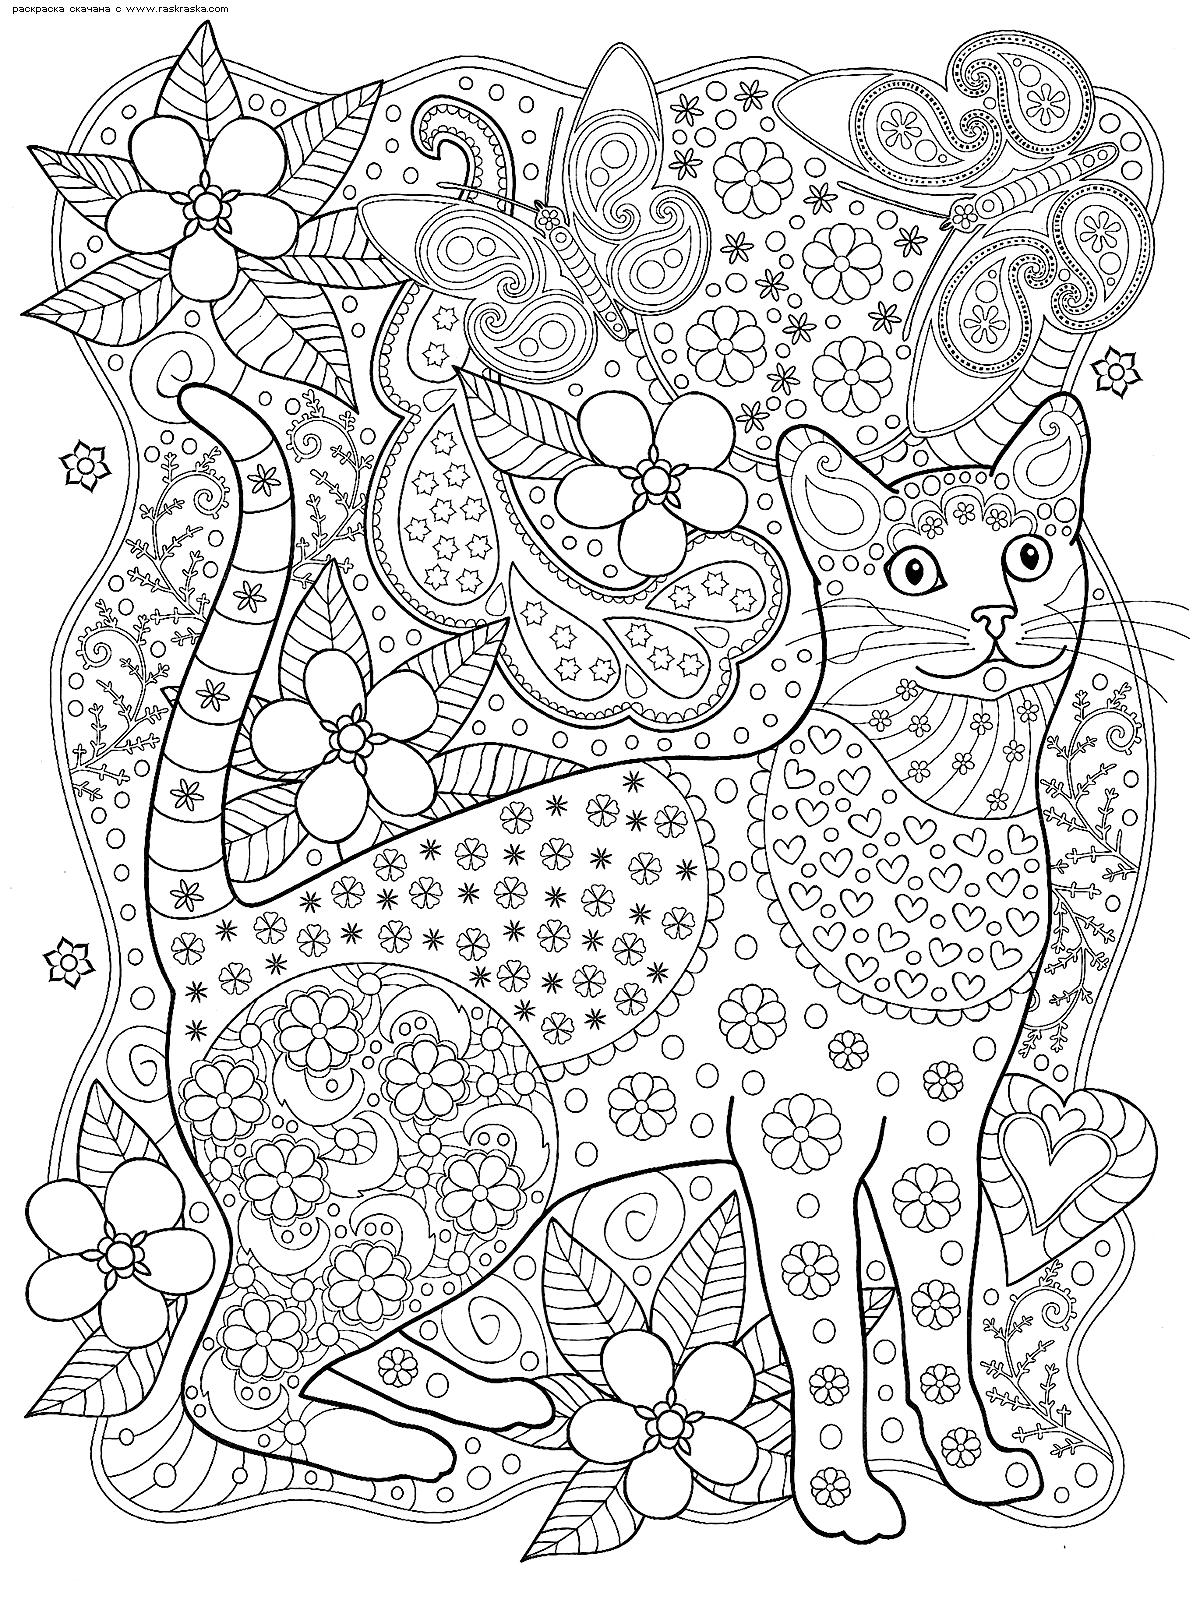 Раскраска Кот и бабочки | Раскраски антистресс Кошки ...